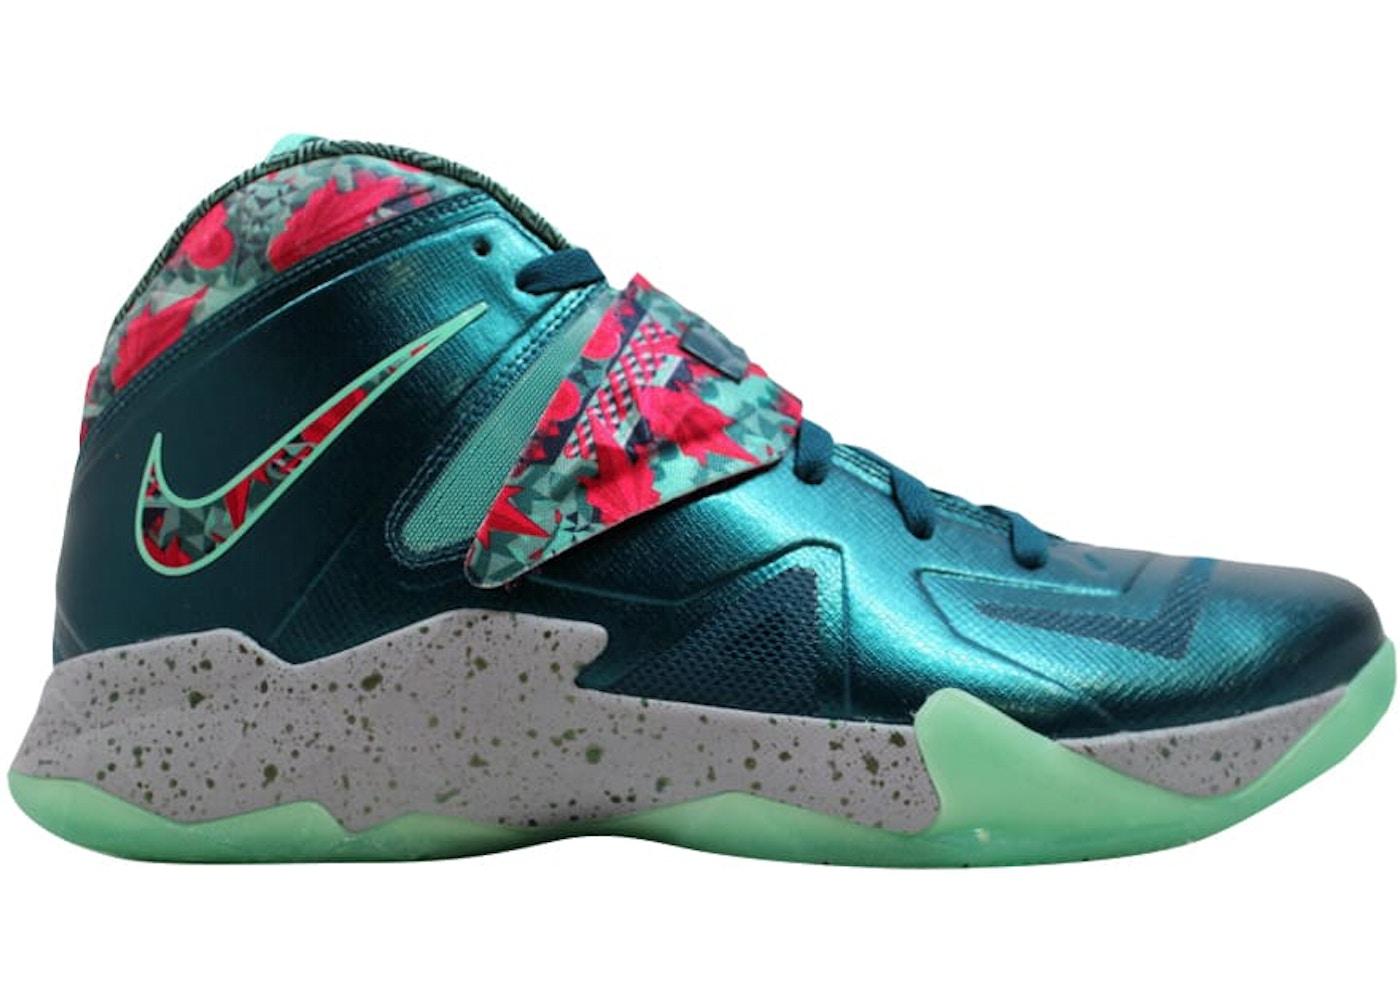 best website eab01 d9d60 Nike Other Shoes - Volatility